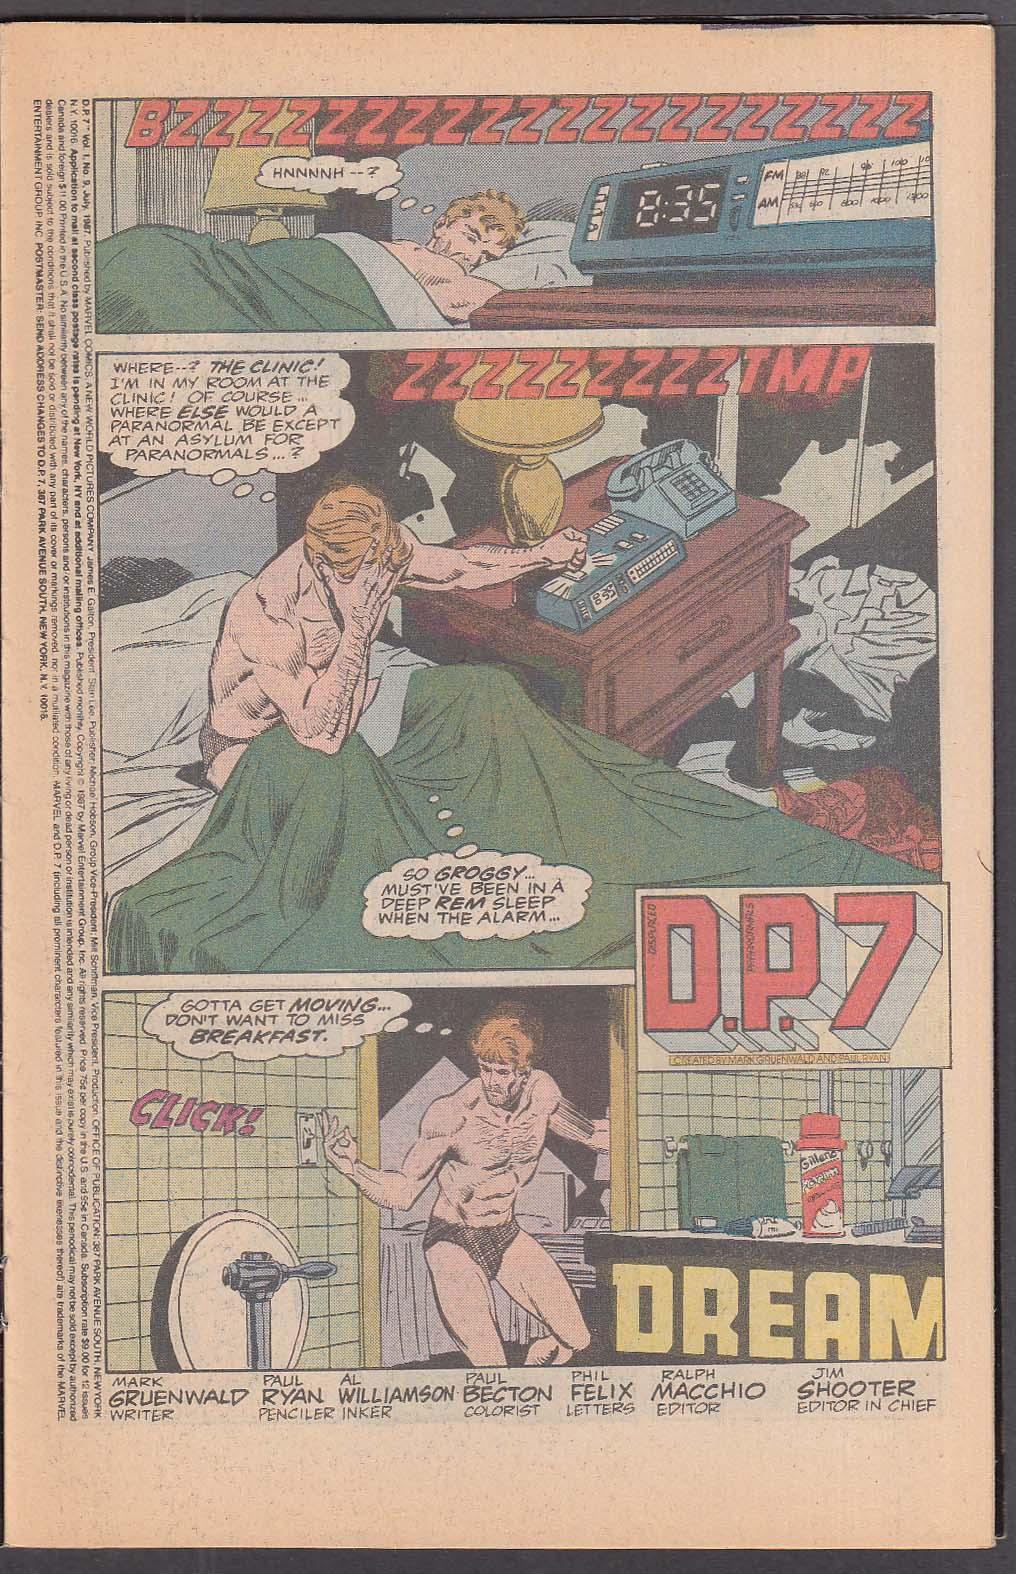 D. P. 7 #9 Marvel New Universe comic 7 1987